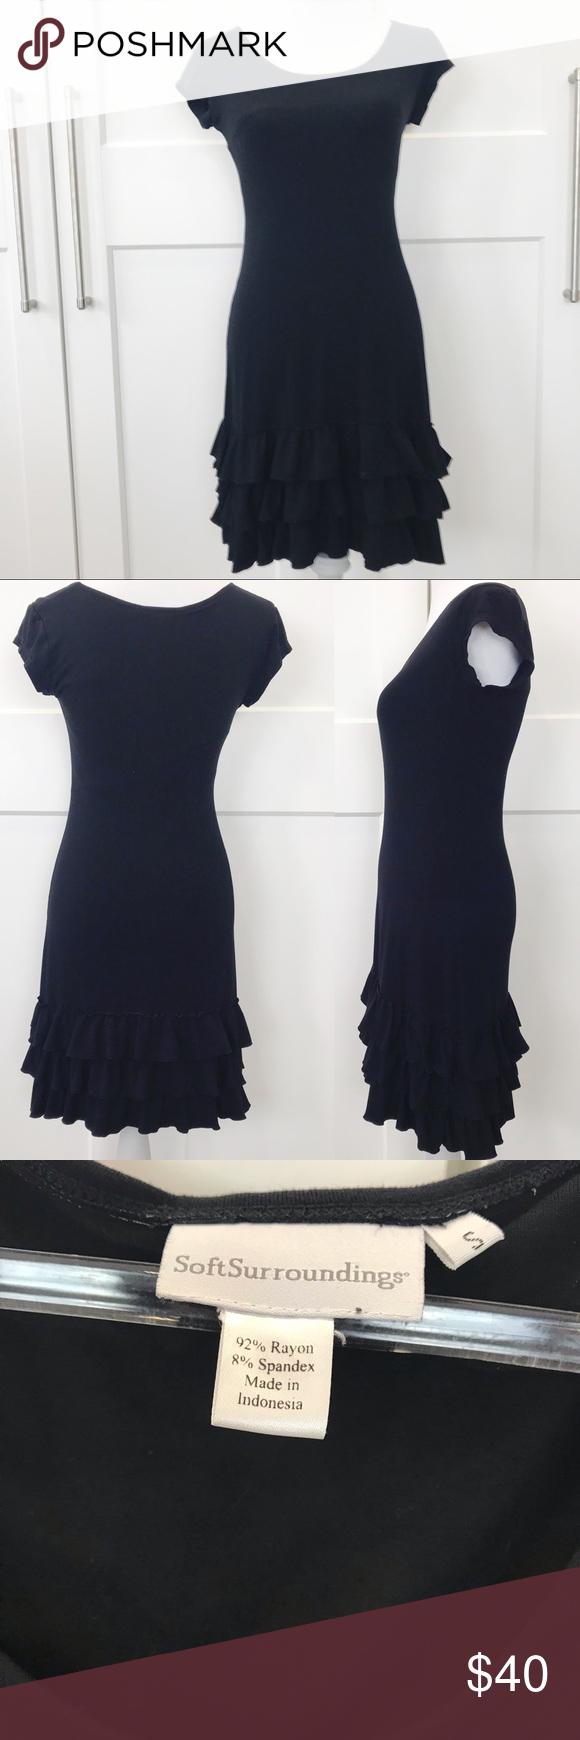 Soft Surroundings Black Dress W Ruffle Bottom Soft Surroundings Dresses Clothes Design Black Dress [ 1740 x 580 Pixel ]